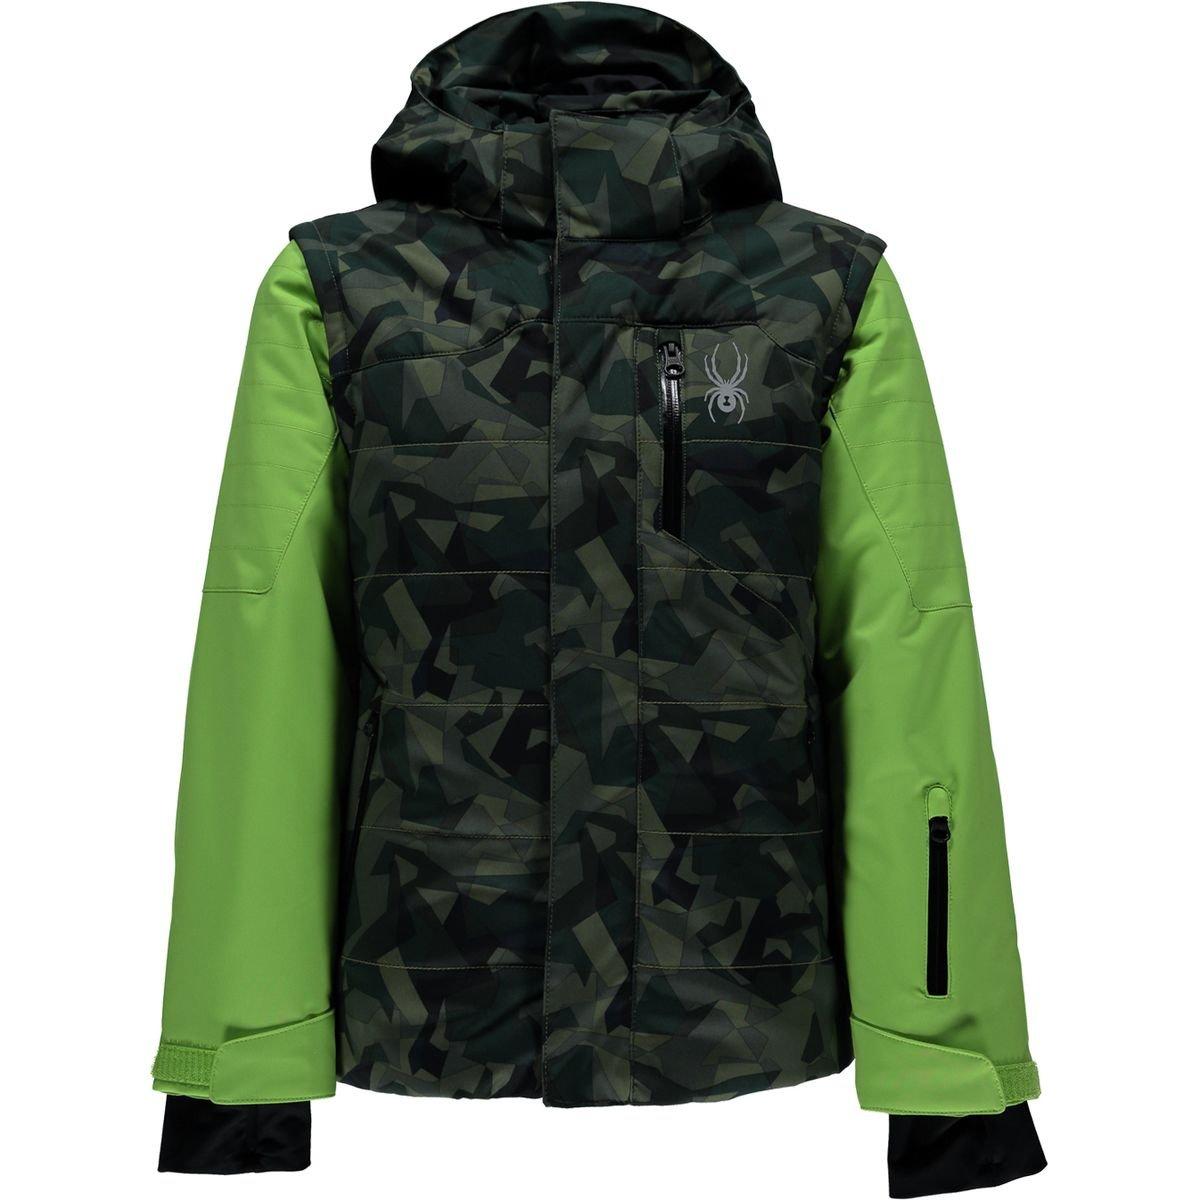 Spyder Kids  Boy's Axis Jacket (Big Kids) Mini Camo Guard/Fresh/Black 12